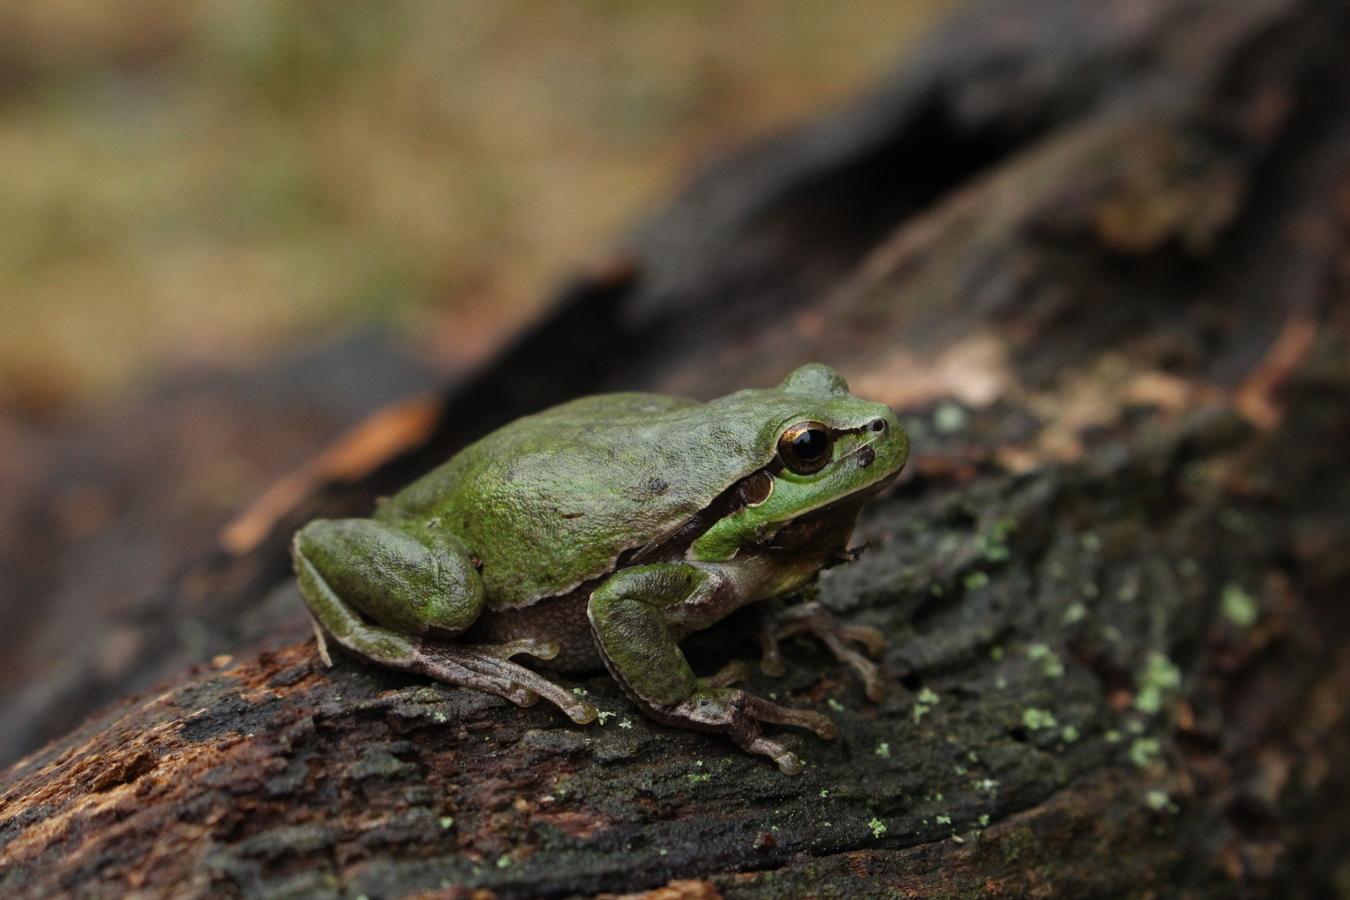 Malá žába